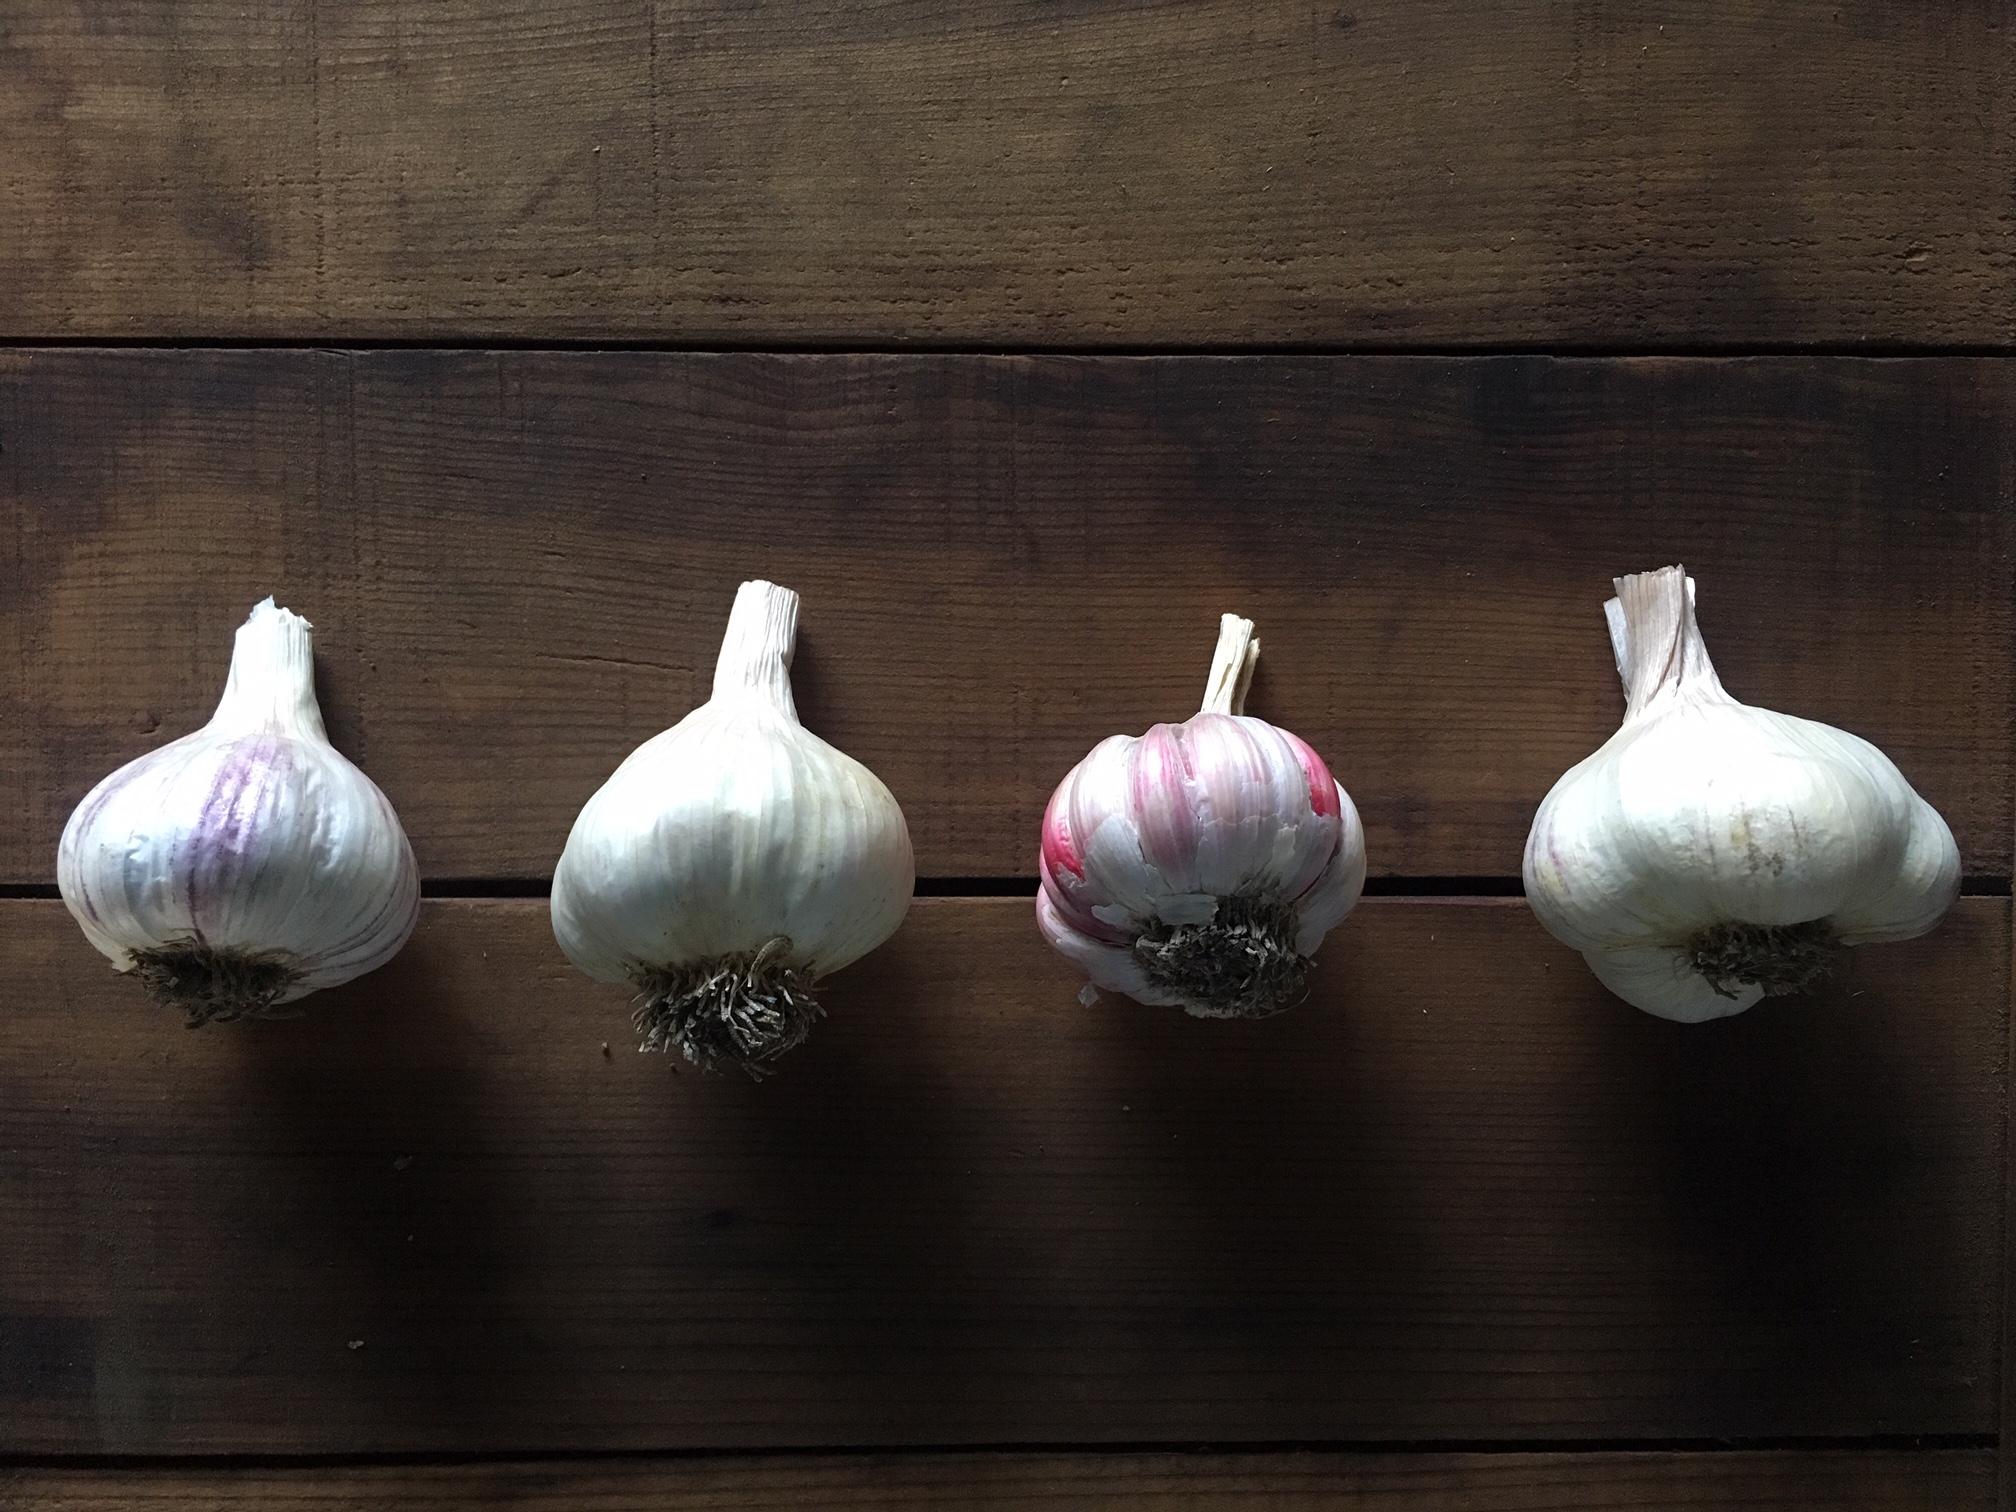 2019's garlic varieties, from L to R: Duganski Hardneck, Italian Late Softneck, Creole Hardneck, Lorz Italian Softneck